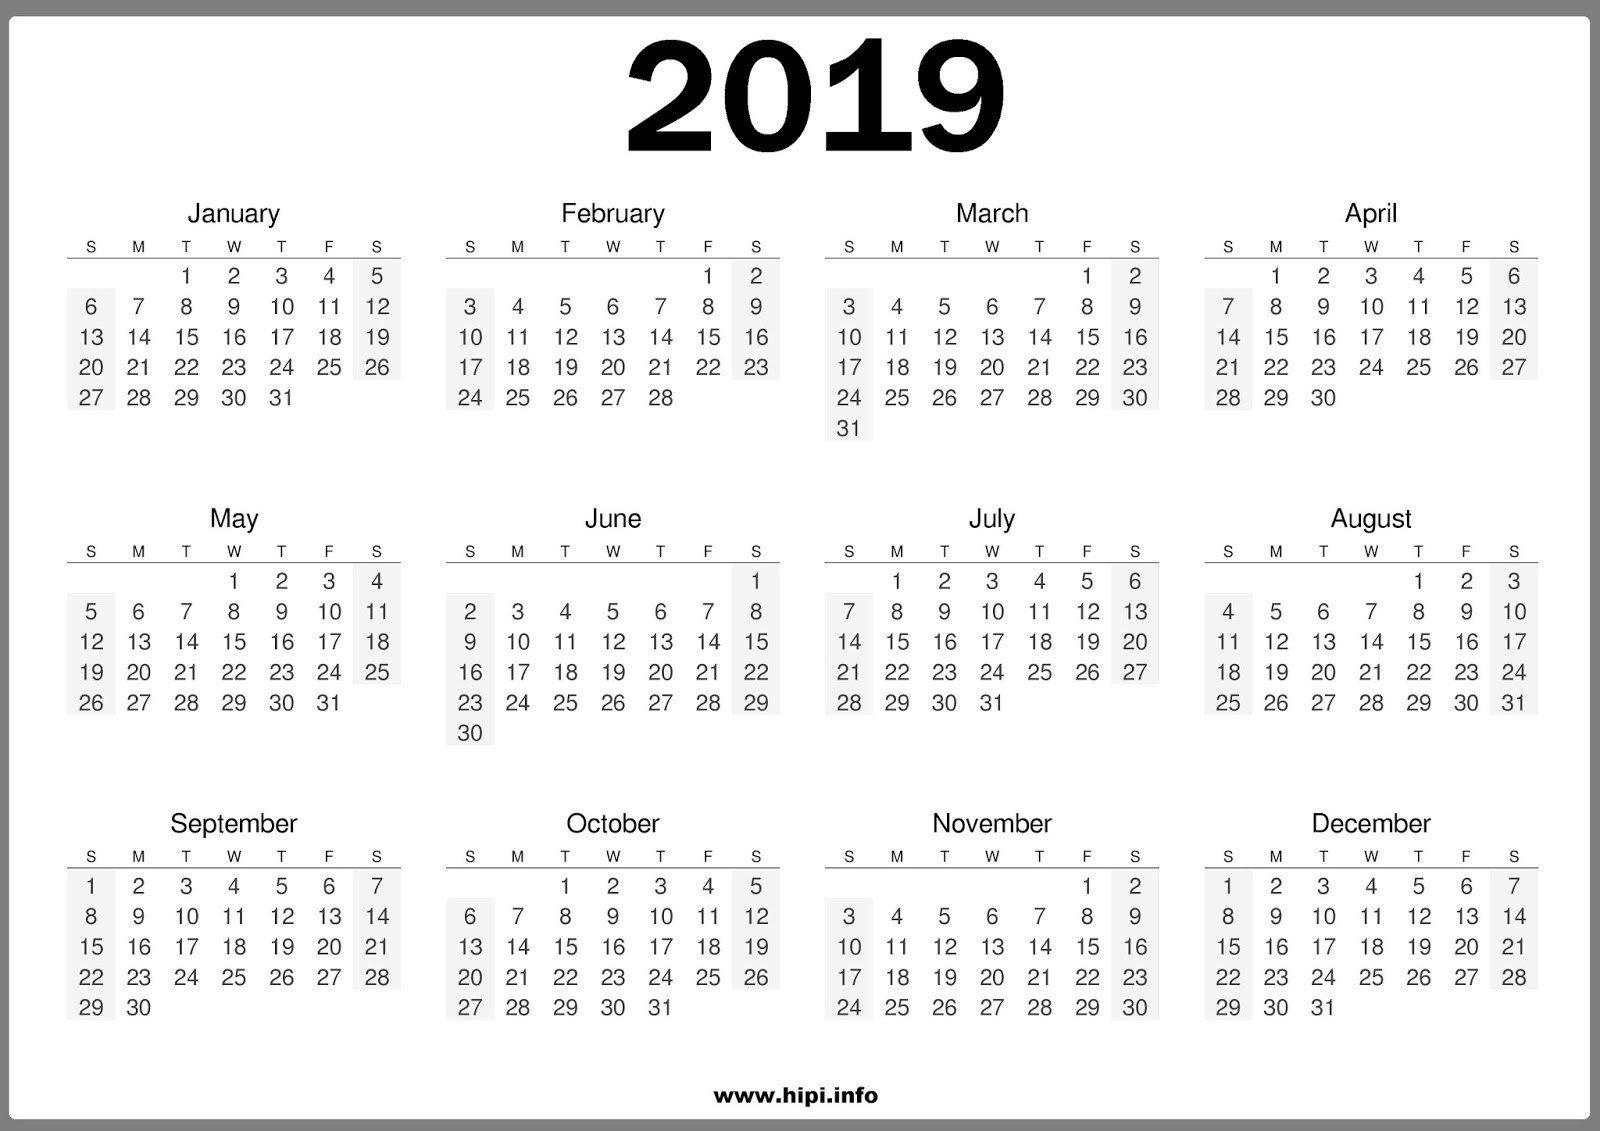 2019 One Page Printable Calendar Free 2019 E Page Calendar Templates Calendar 2019 Single Page